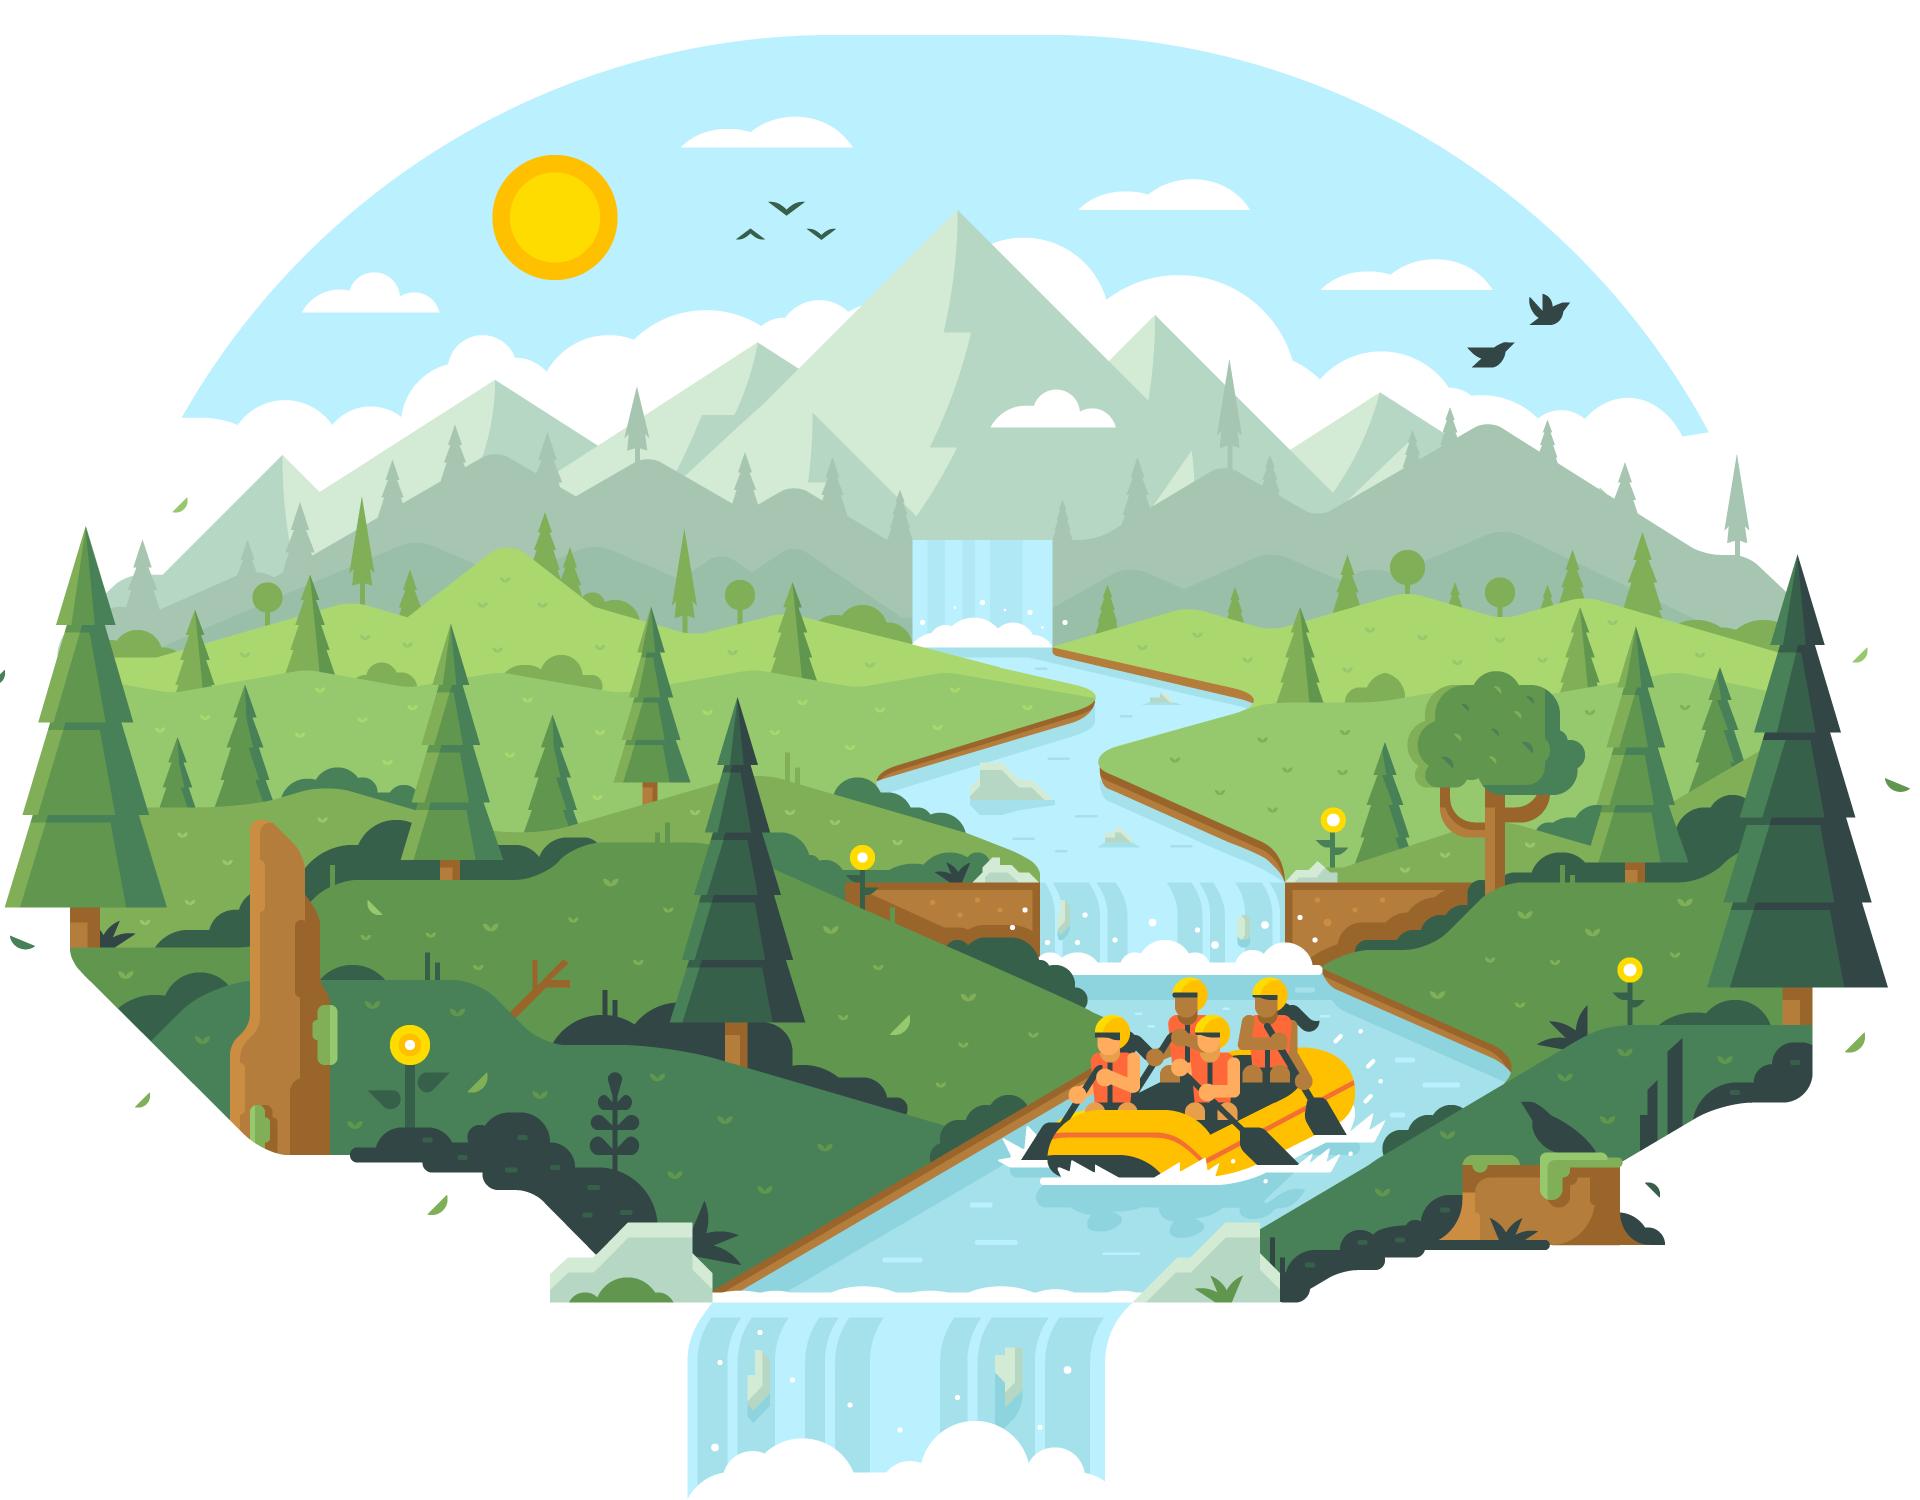 CSS Healthcare Website Illustrations by Matt Anderson - White Water Rafting Hero Art